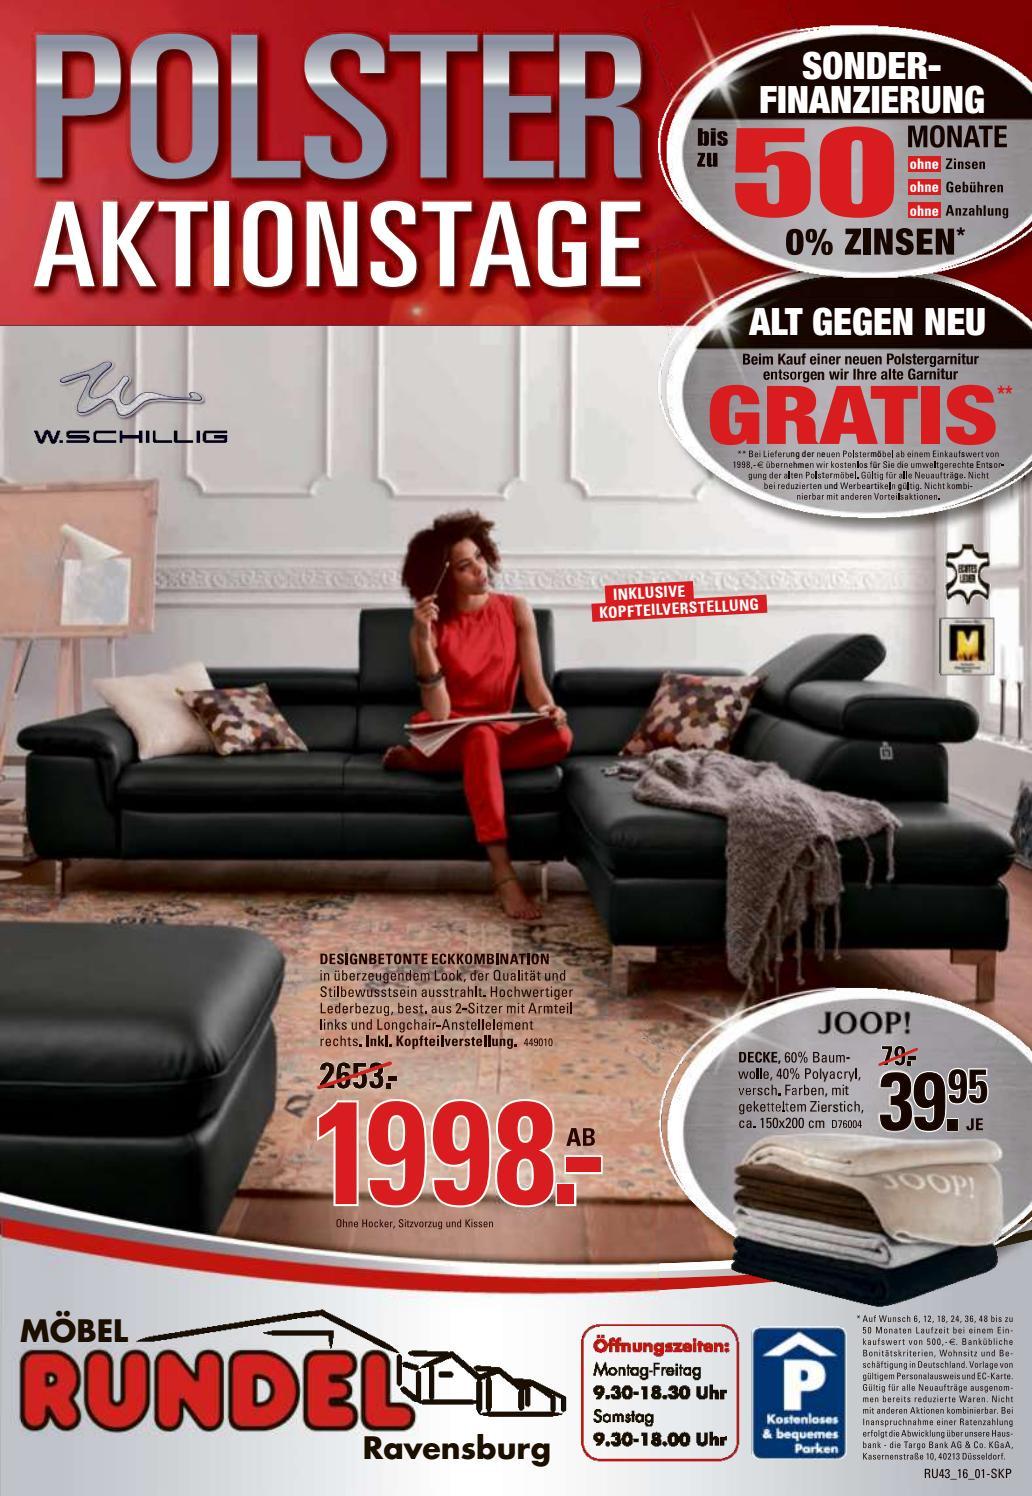 moebel rundel kw43 by russmedia digital gmbh issuu. Black Bedroom Furniture Sets. Home Design Ideas